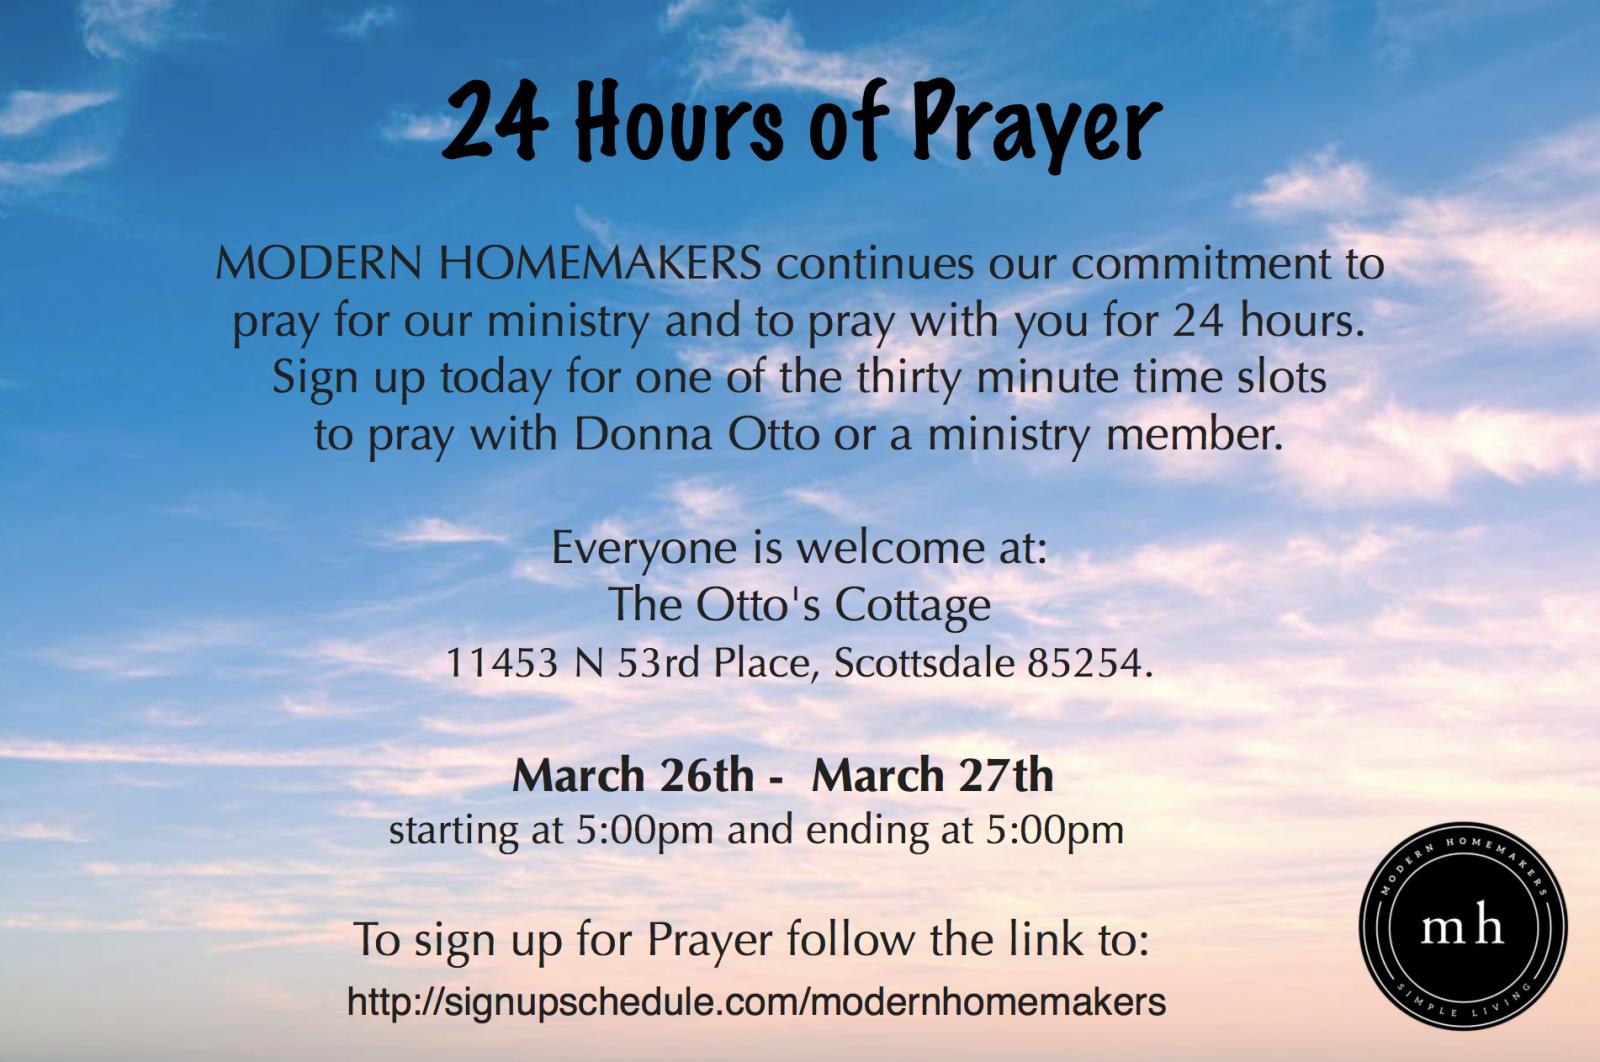 24 HOUR DAY OF PRAYER